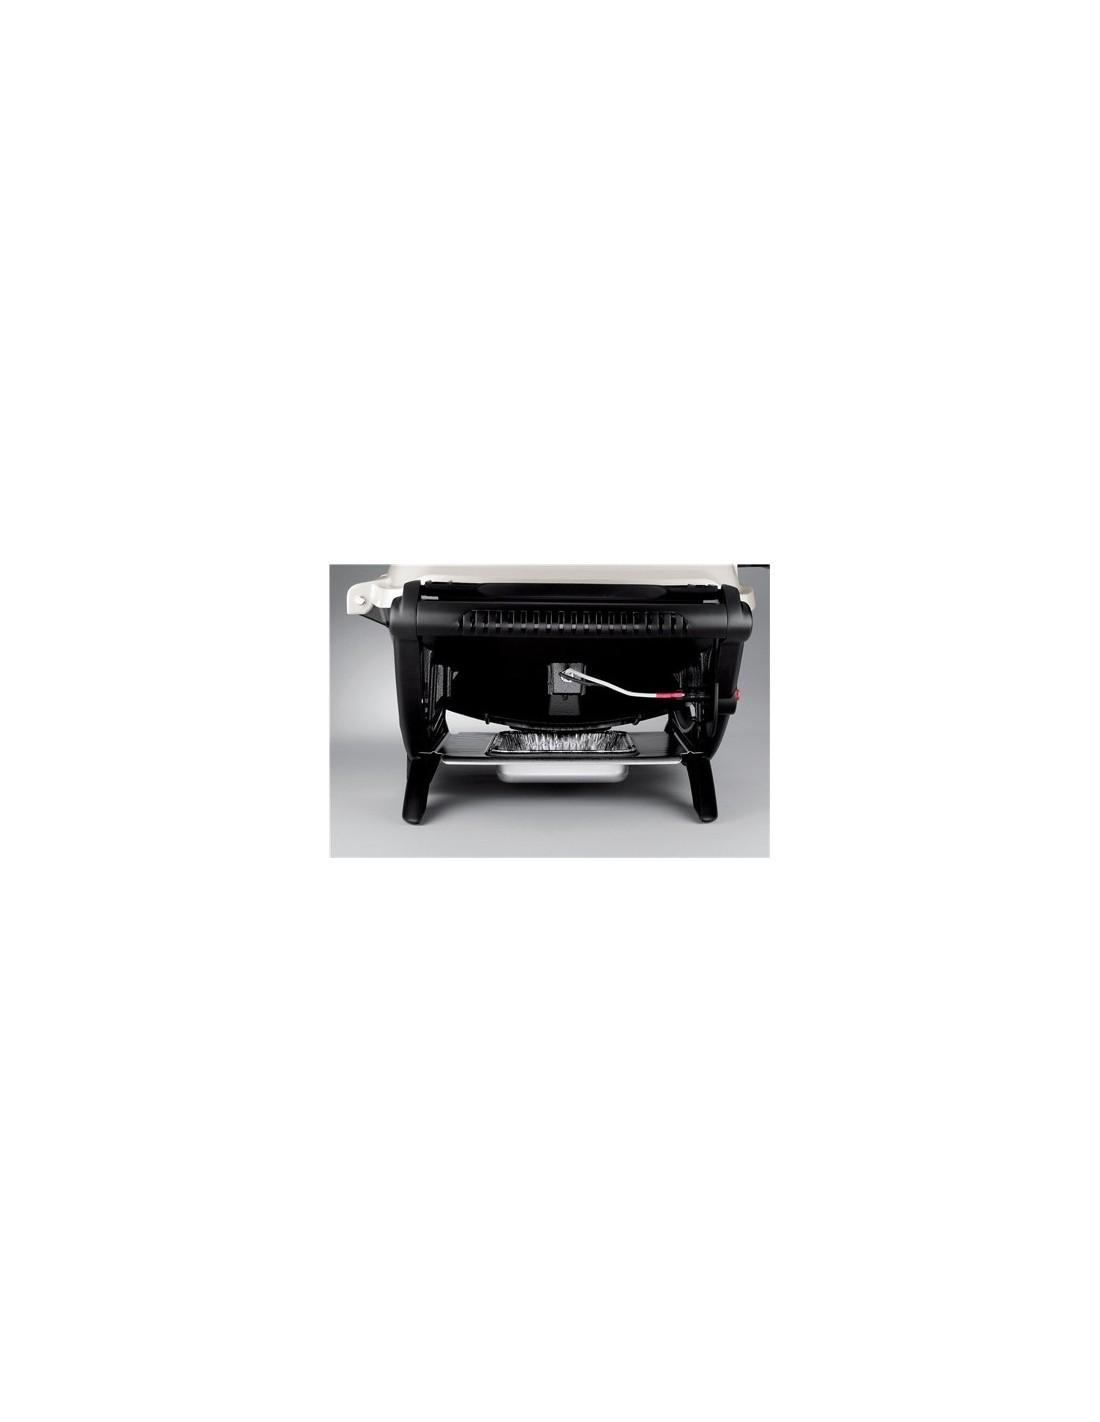 Barbecue gaz q2200 black noir weber avec thermom tre integr - Barbecue weber gaz ...